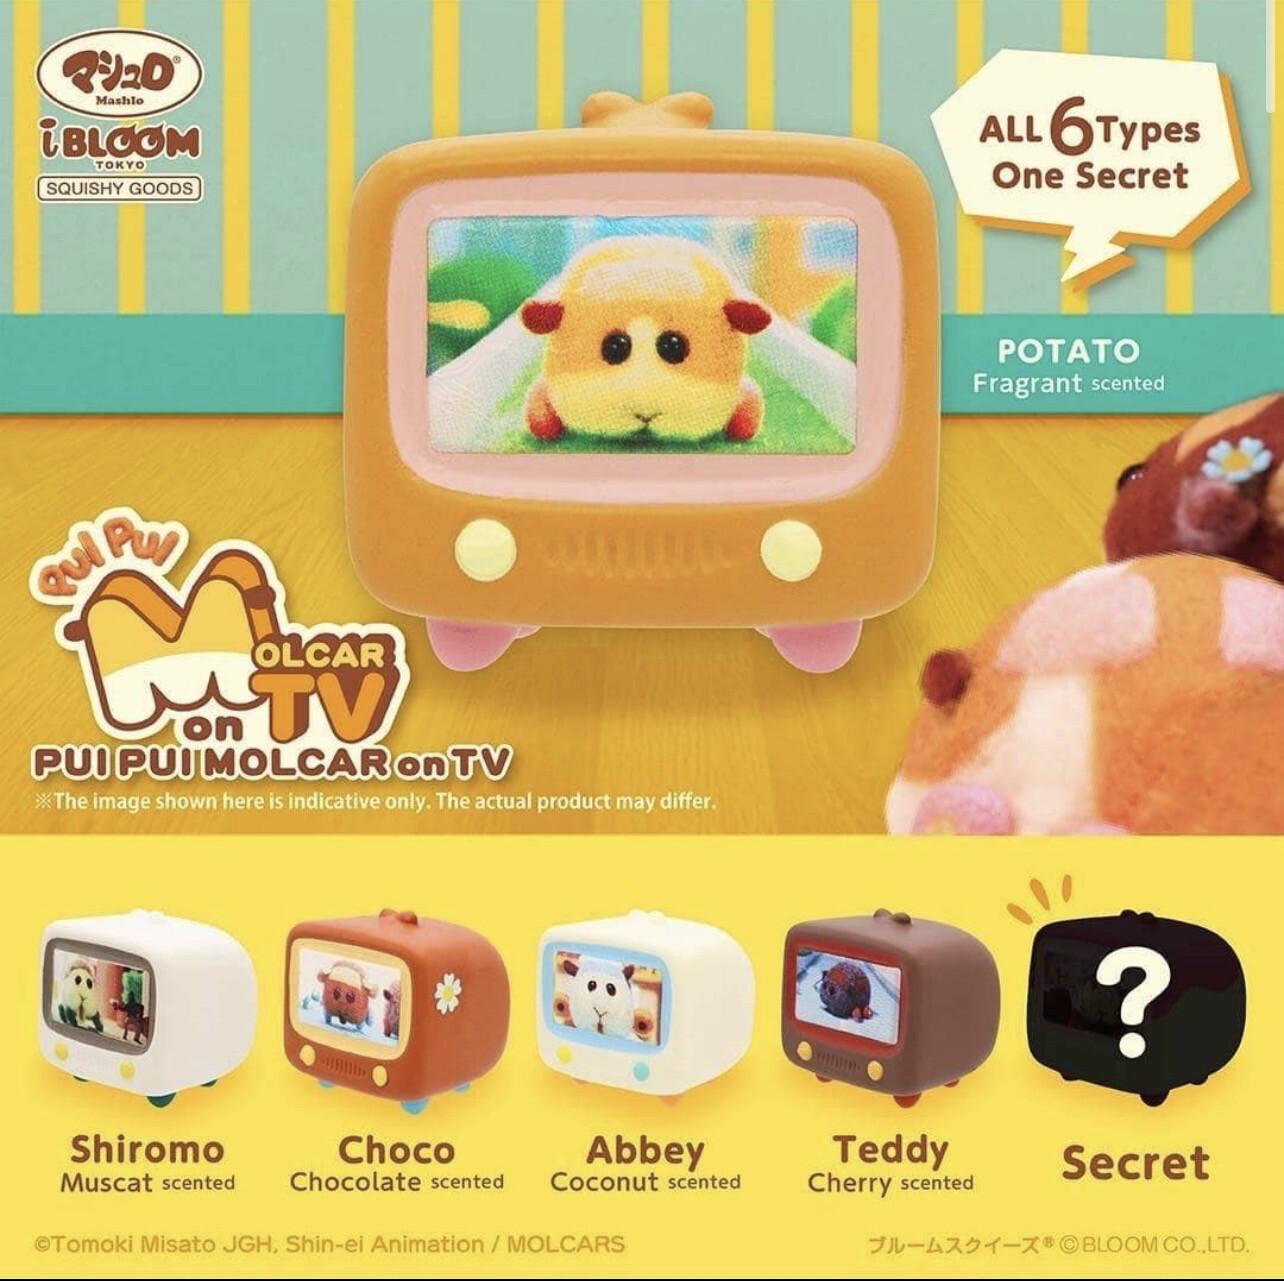 iBloom Pui Pui Molcar Mini Television TV Squishy Blind Box